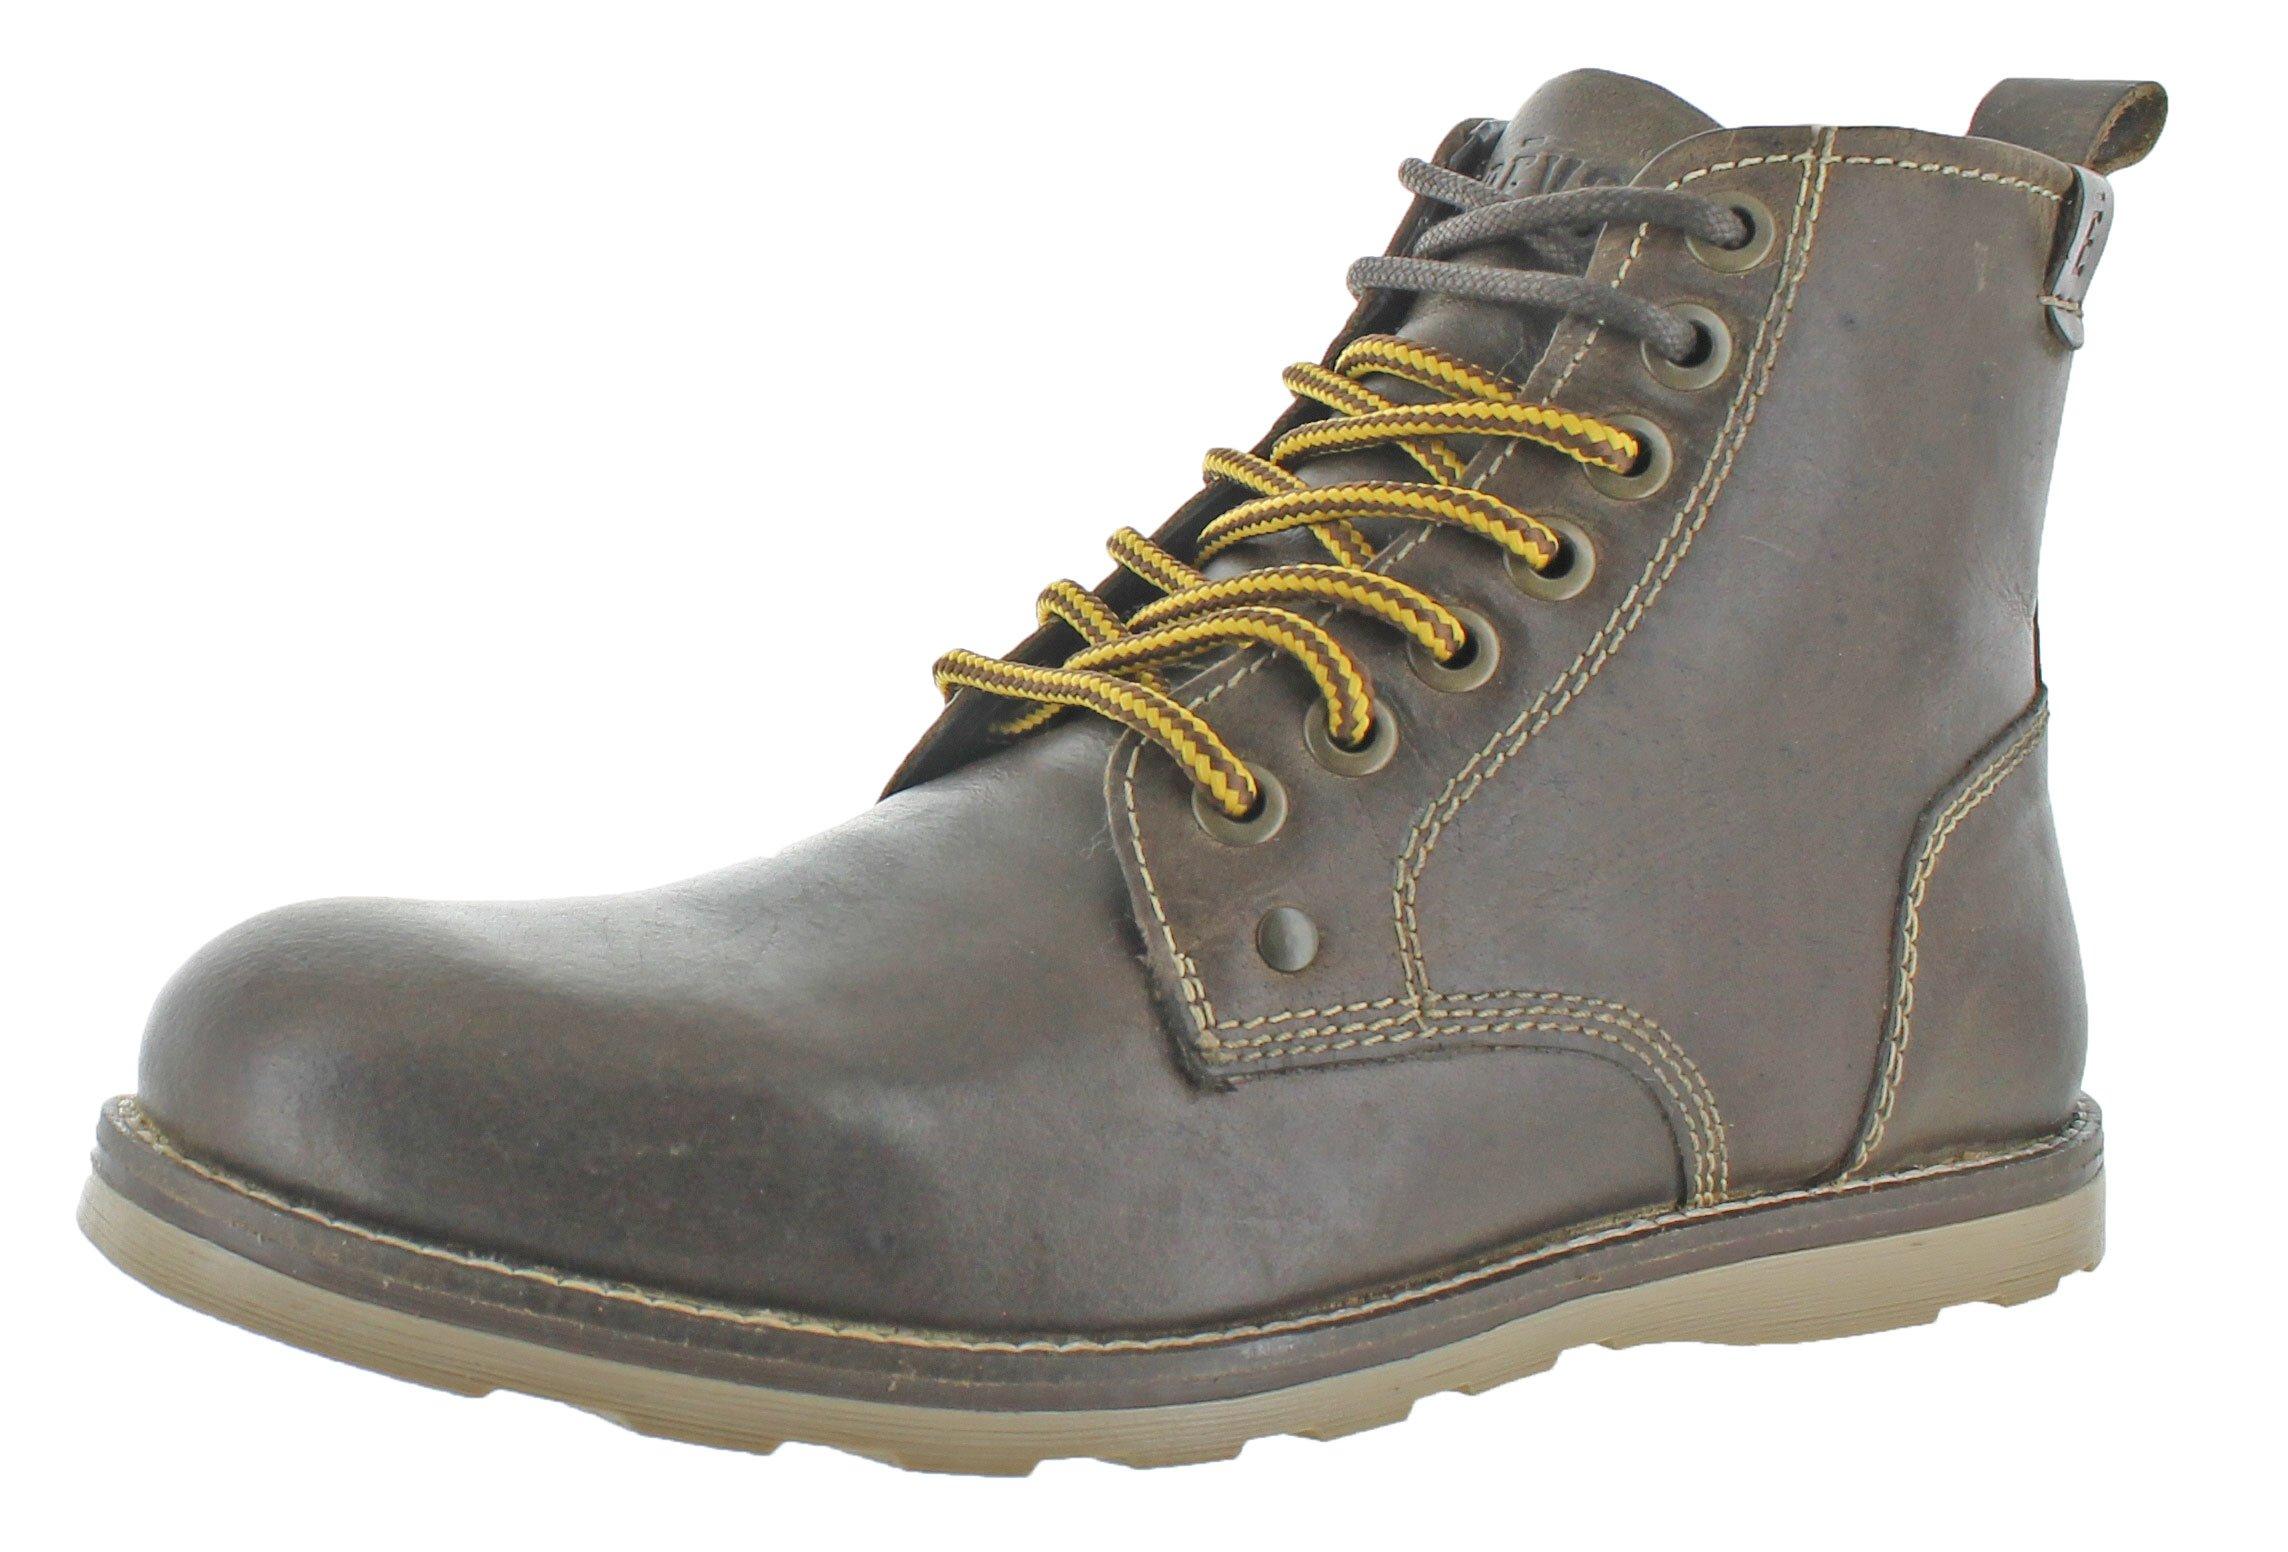 Crevo Men's Ranger Winter Boot, Dark Brown Leather, 10.5 M US